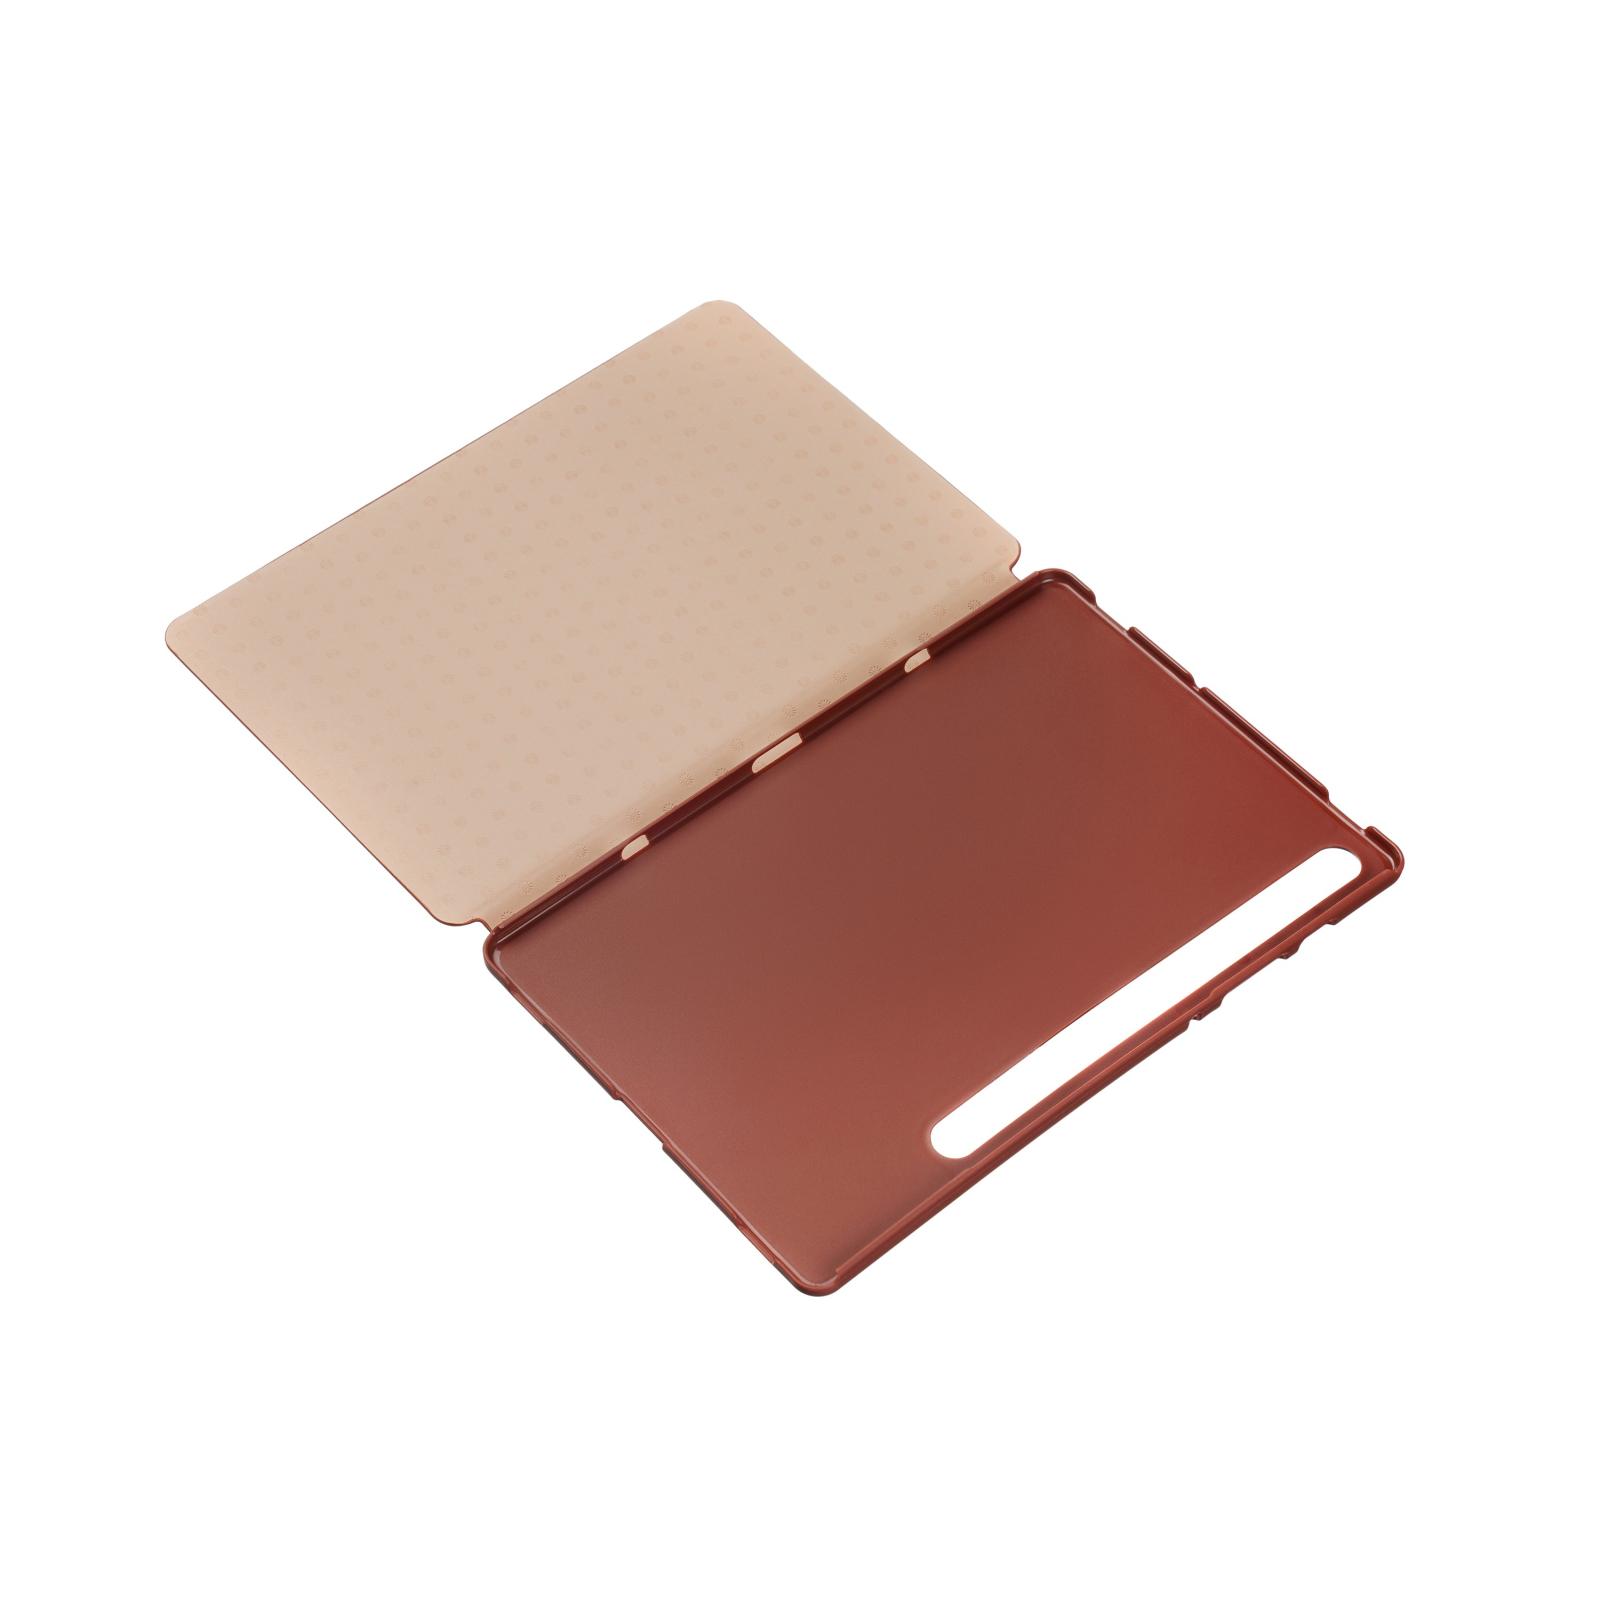 Чохол до планшета 2E Samsung Galaxy Tab S6, Retro, Brown (2E-G-S6-IKRT-BR) зображення 3